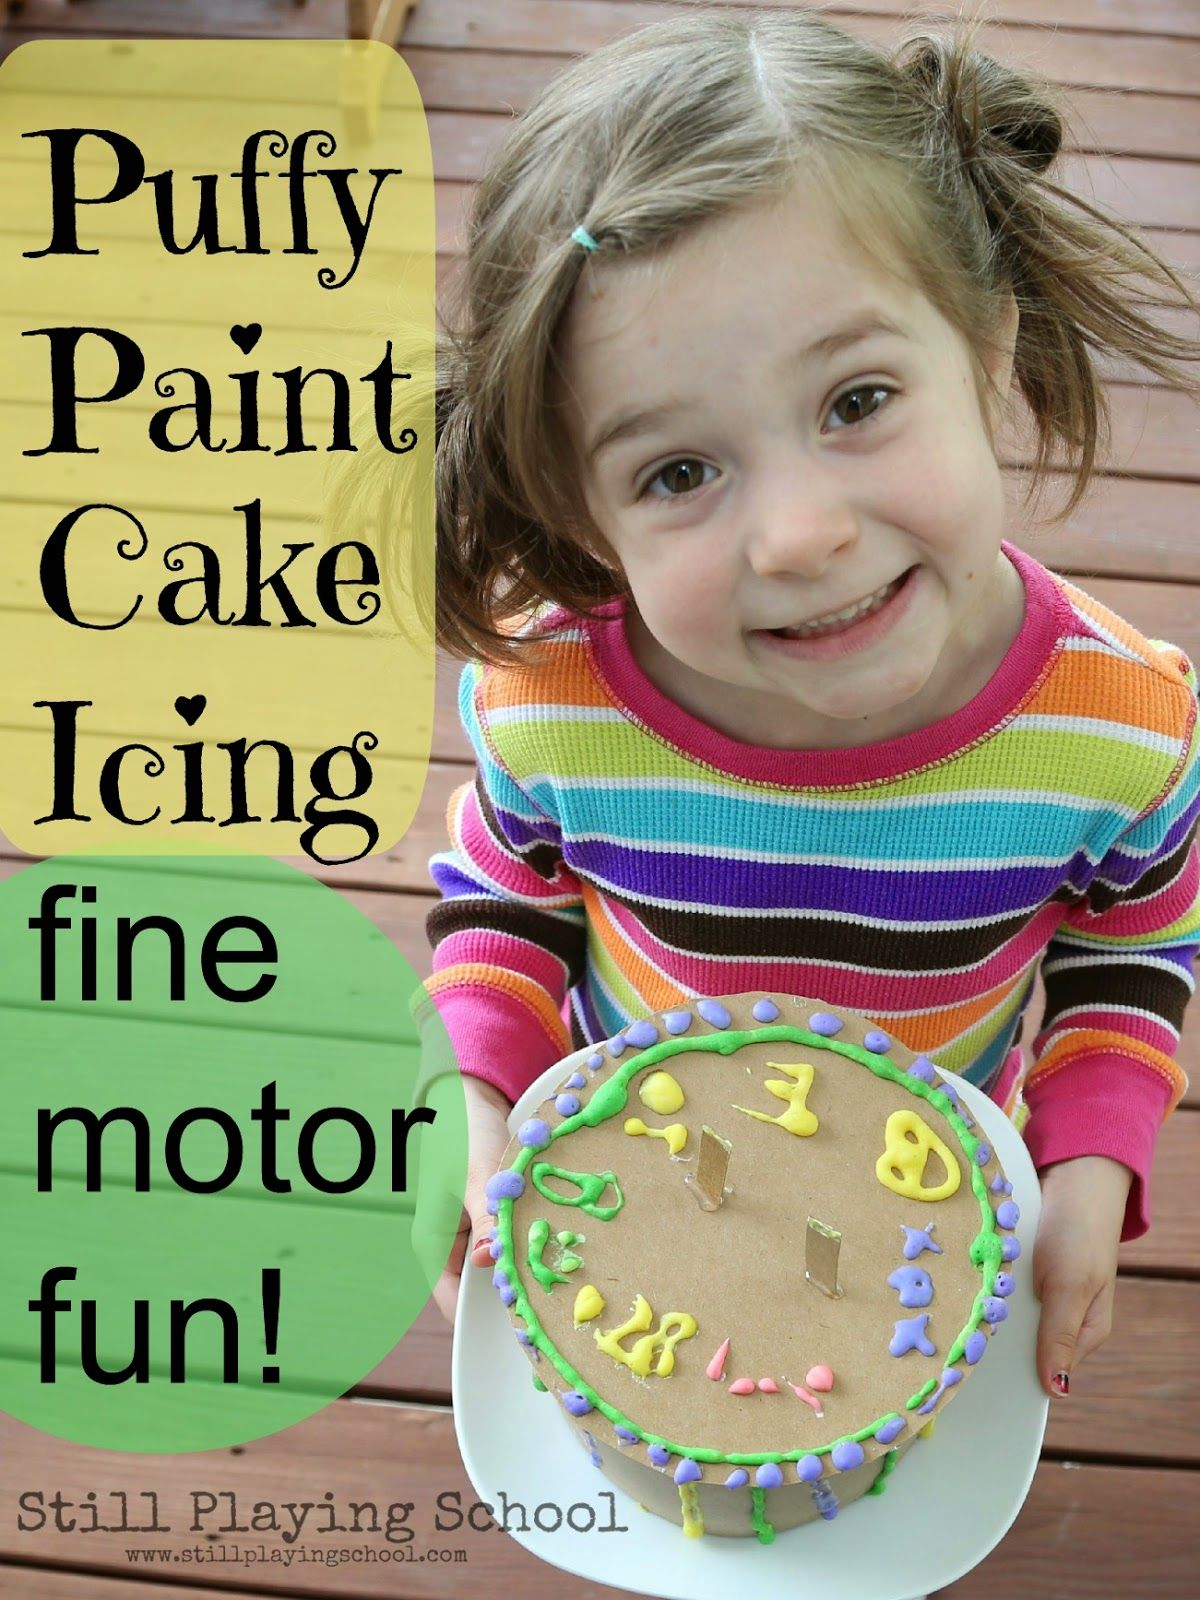 Puffy Paint Cake Decorating